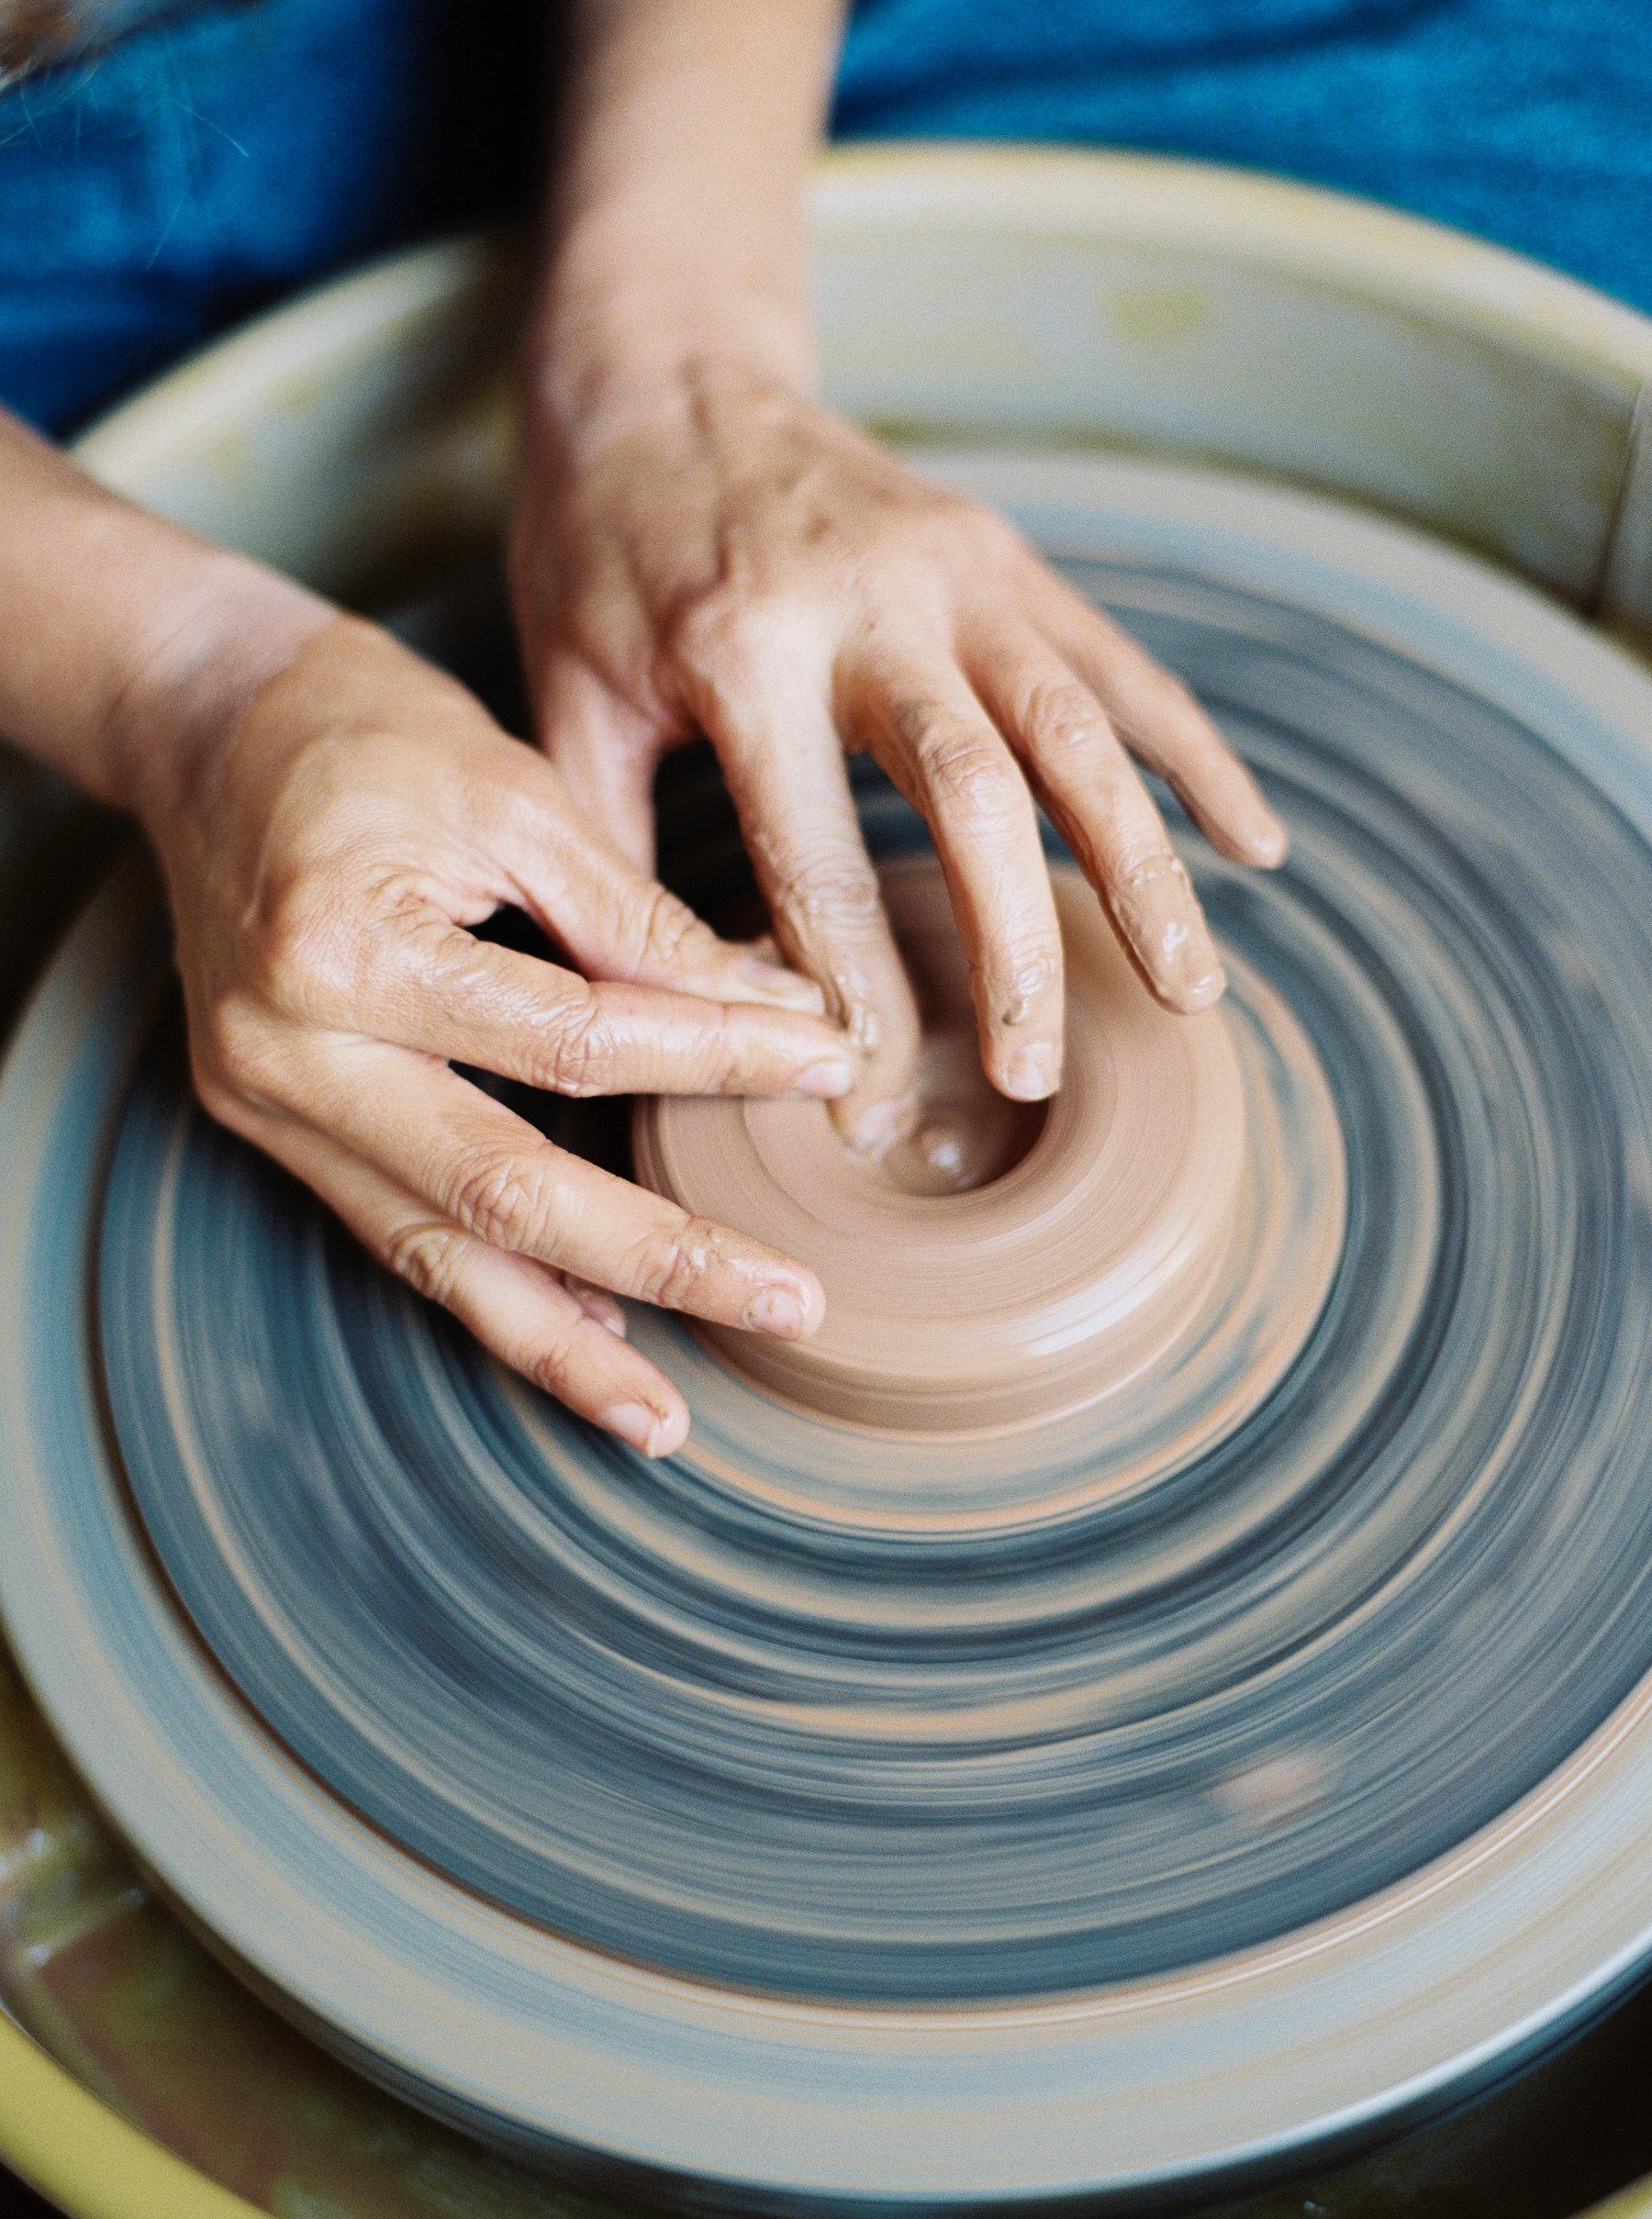 artistprofile-katherinemoes-pottery-annapeters-annapetersphoto-unearthing.tc-5.jpg